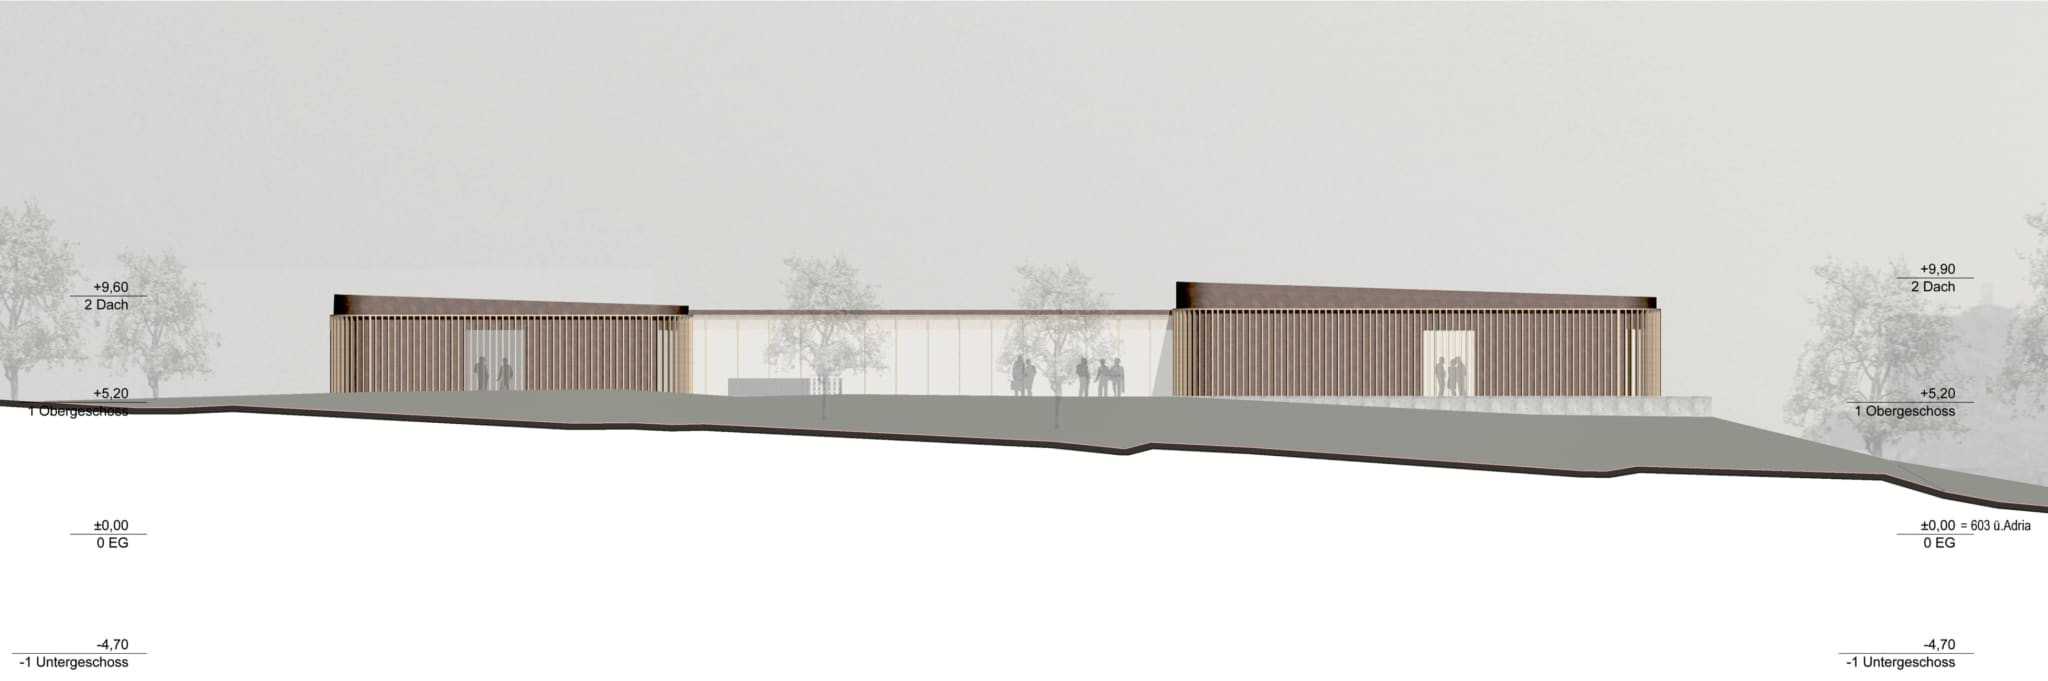 kunstsammlung, forschungszentrum, hall in tirol, kunstdepot, architektur, wettbewerb, kunst